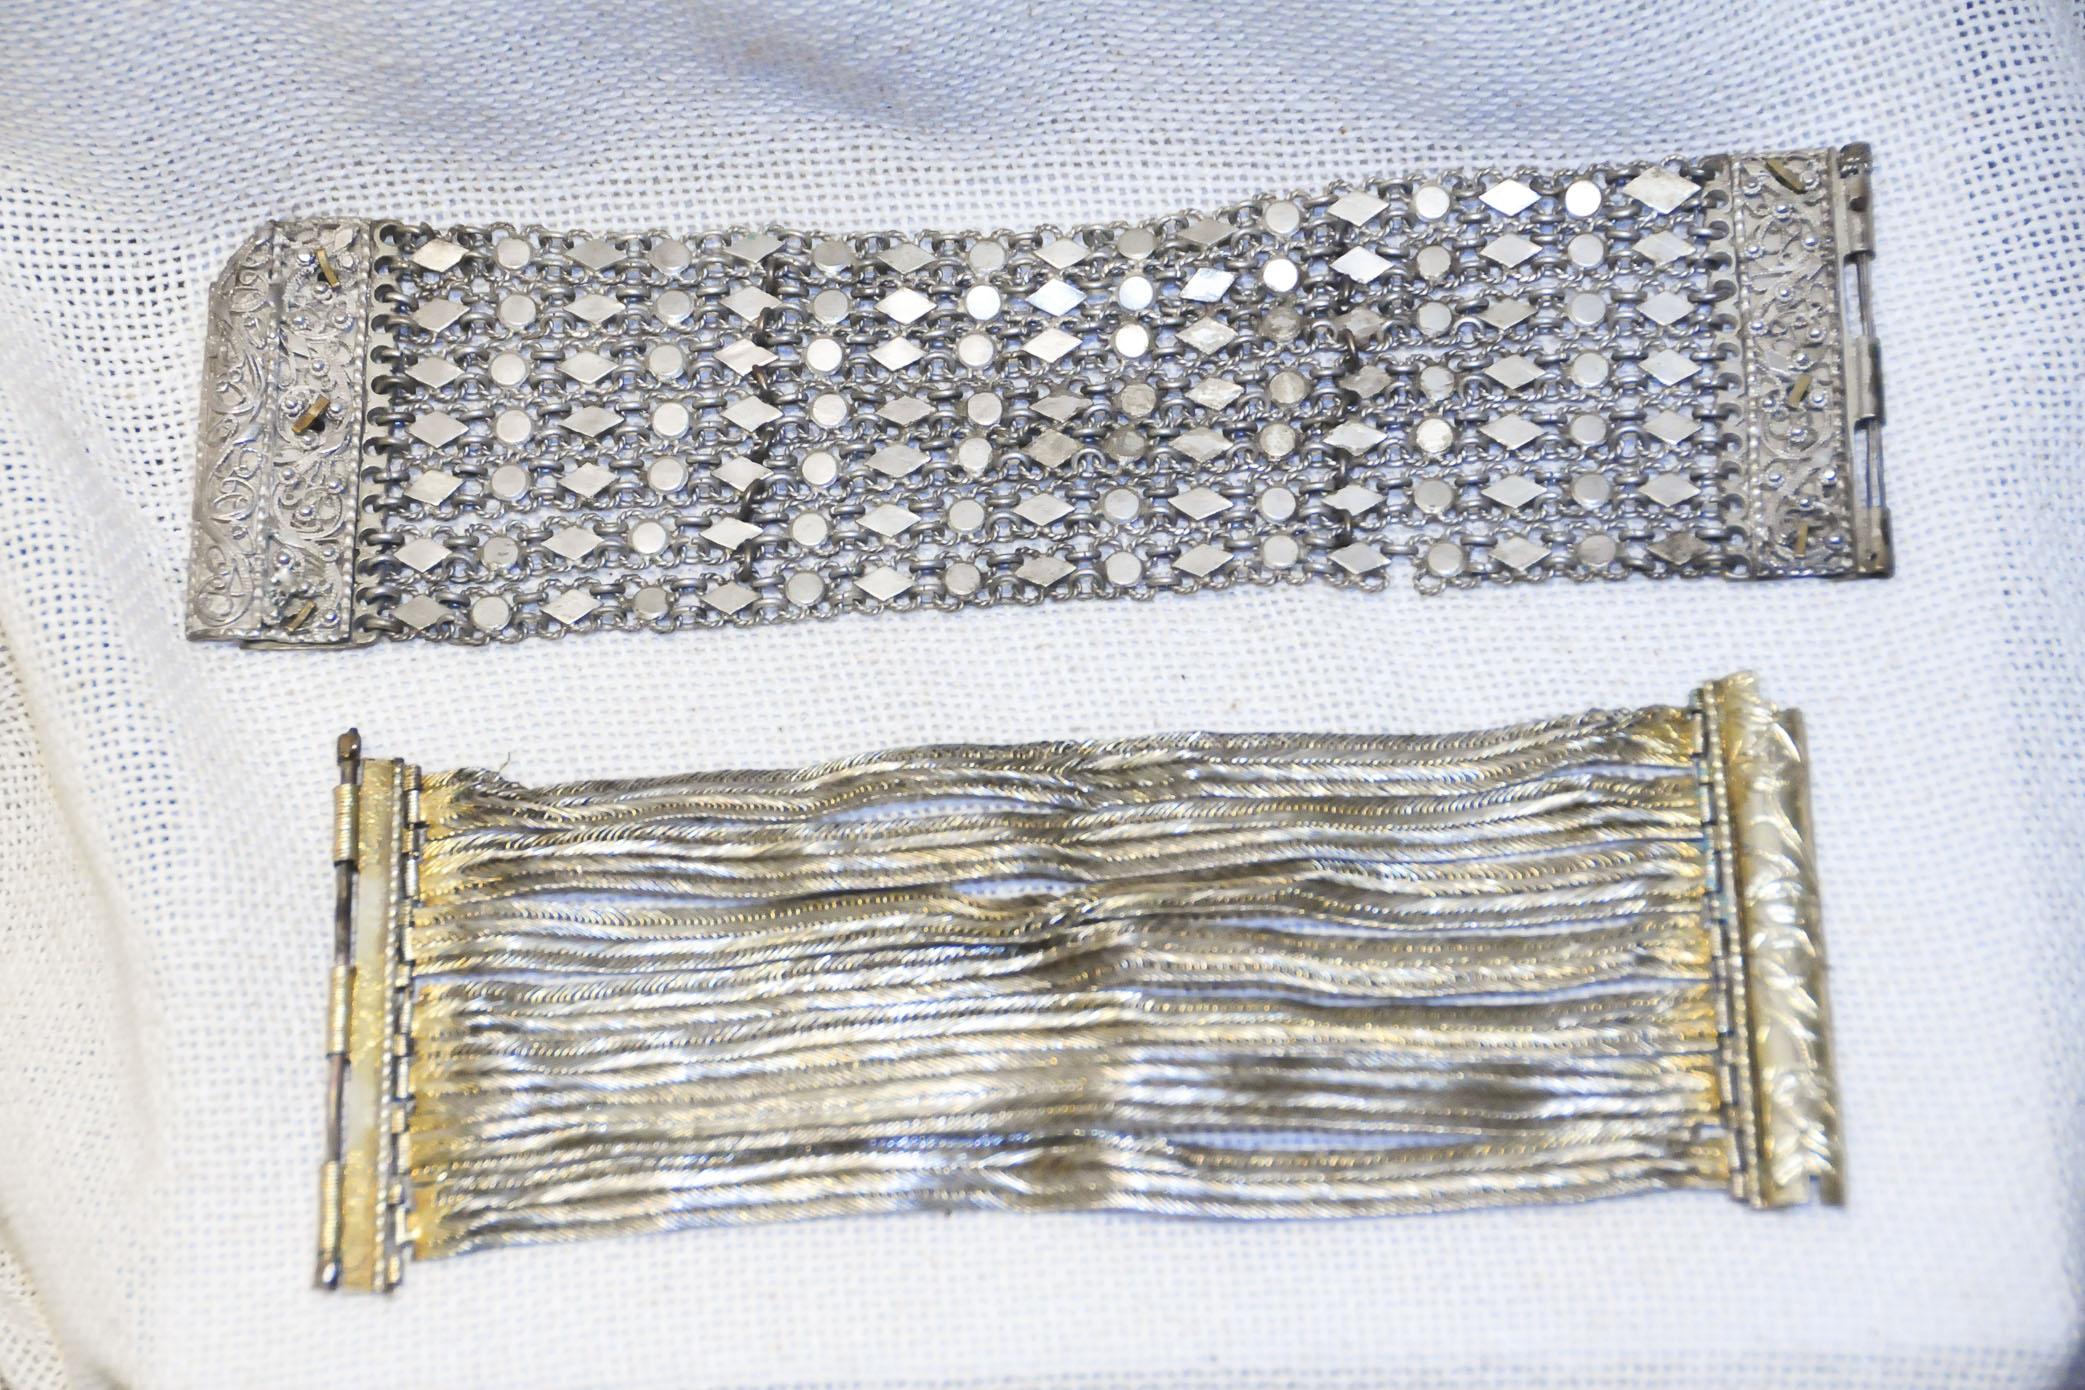 troyan-museum-ot-zlatnite-im-ruce-10